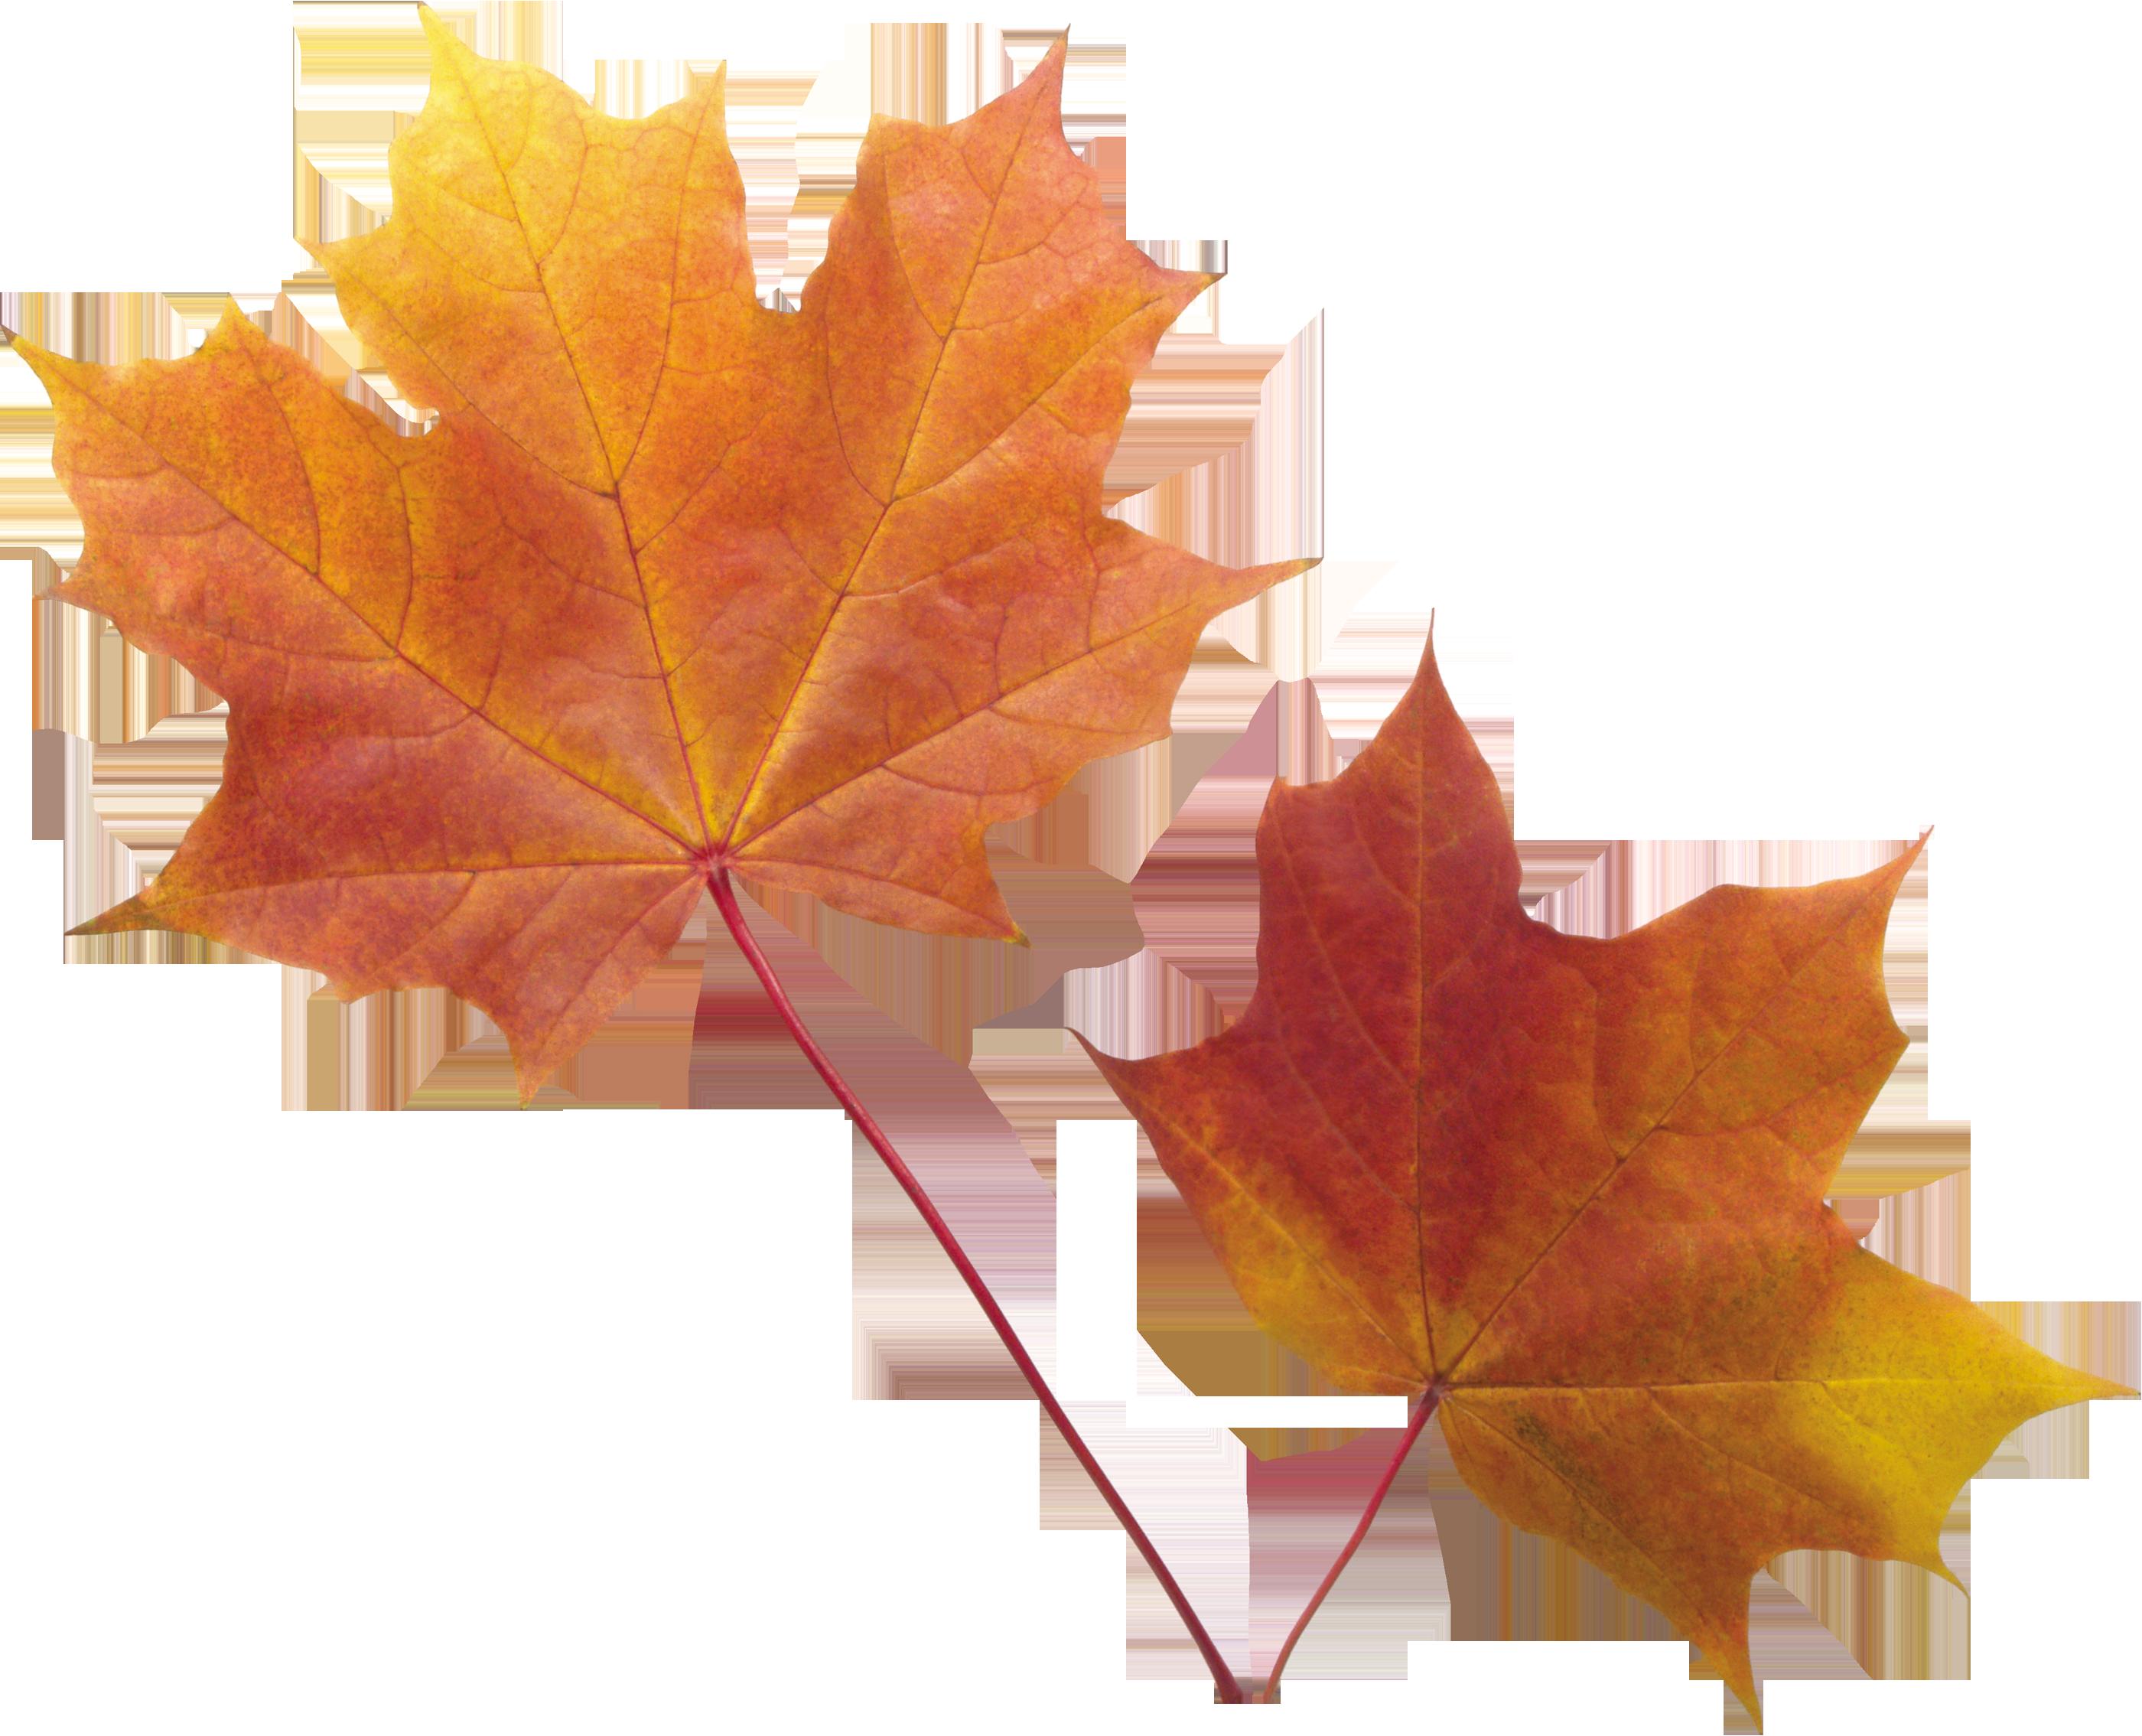 Autumn Leaf PNG Image - PurePNG | Free transparent CC0 PNG ...